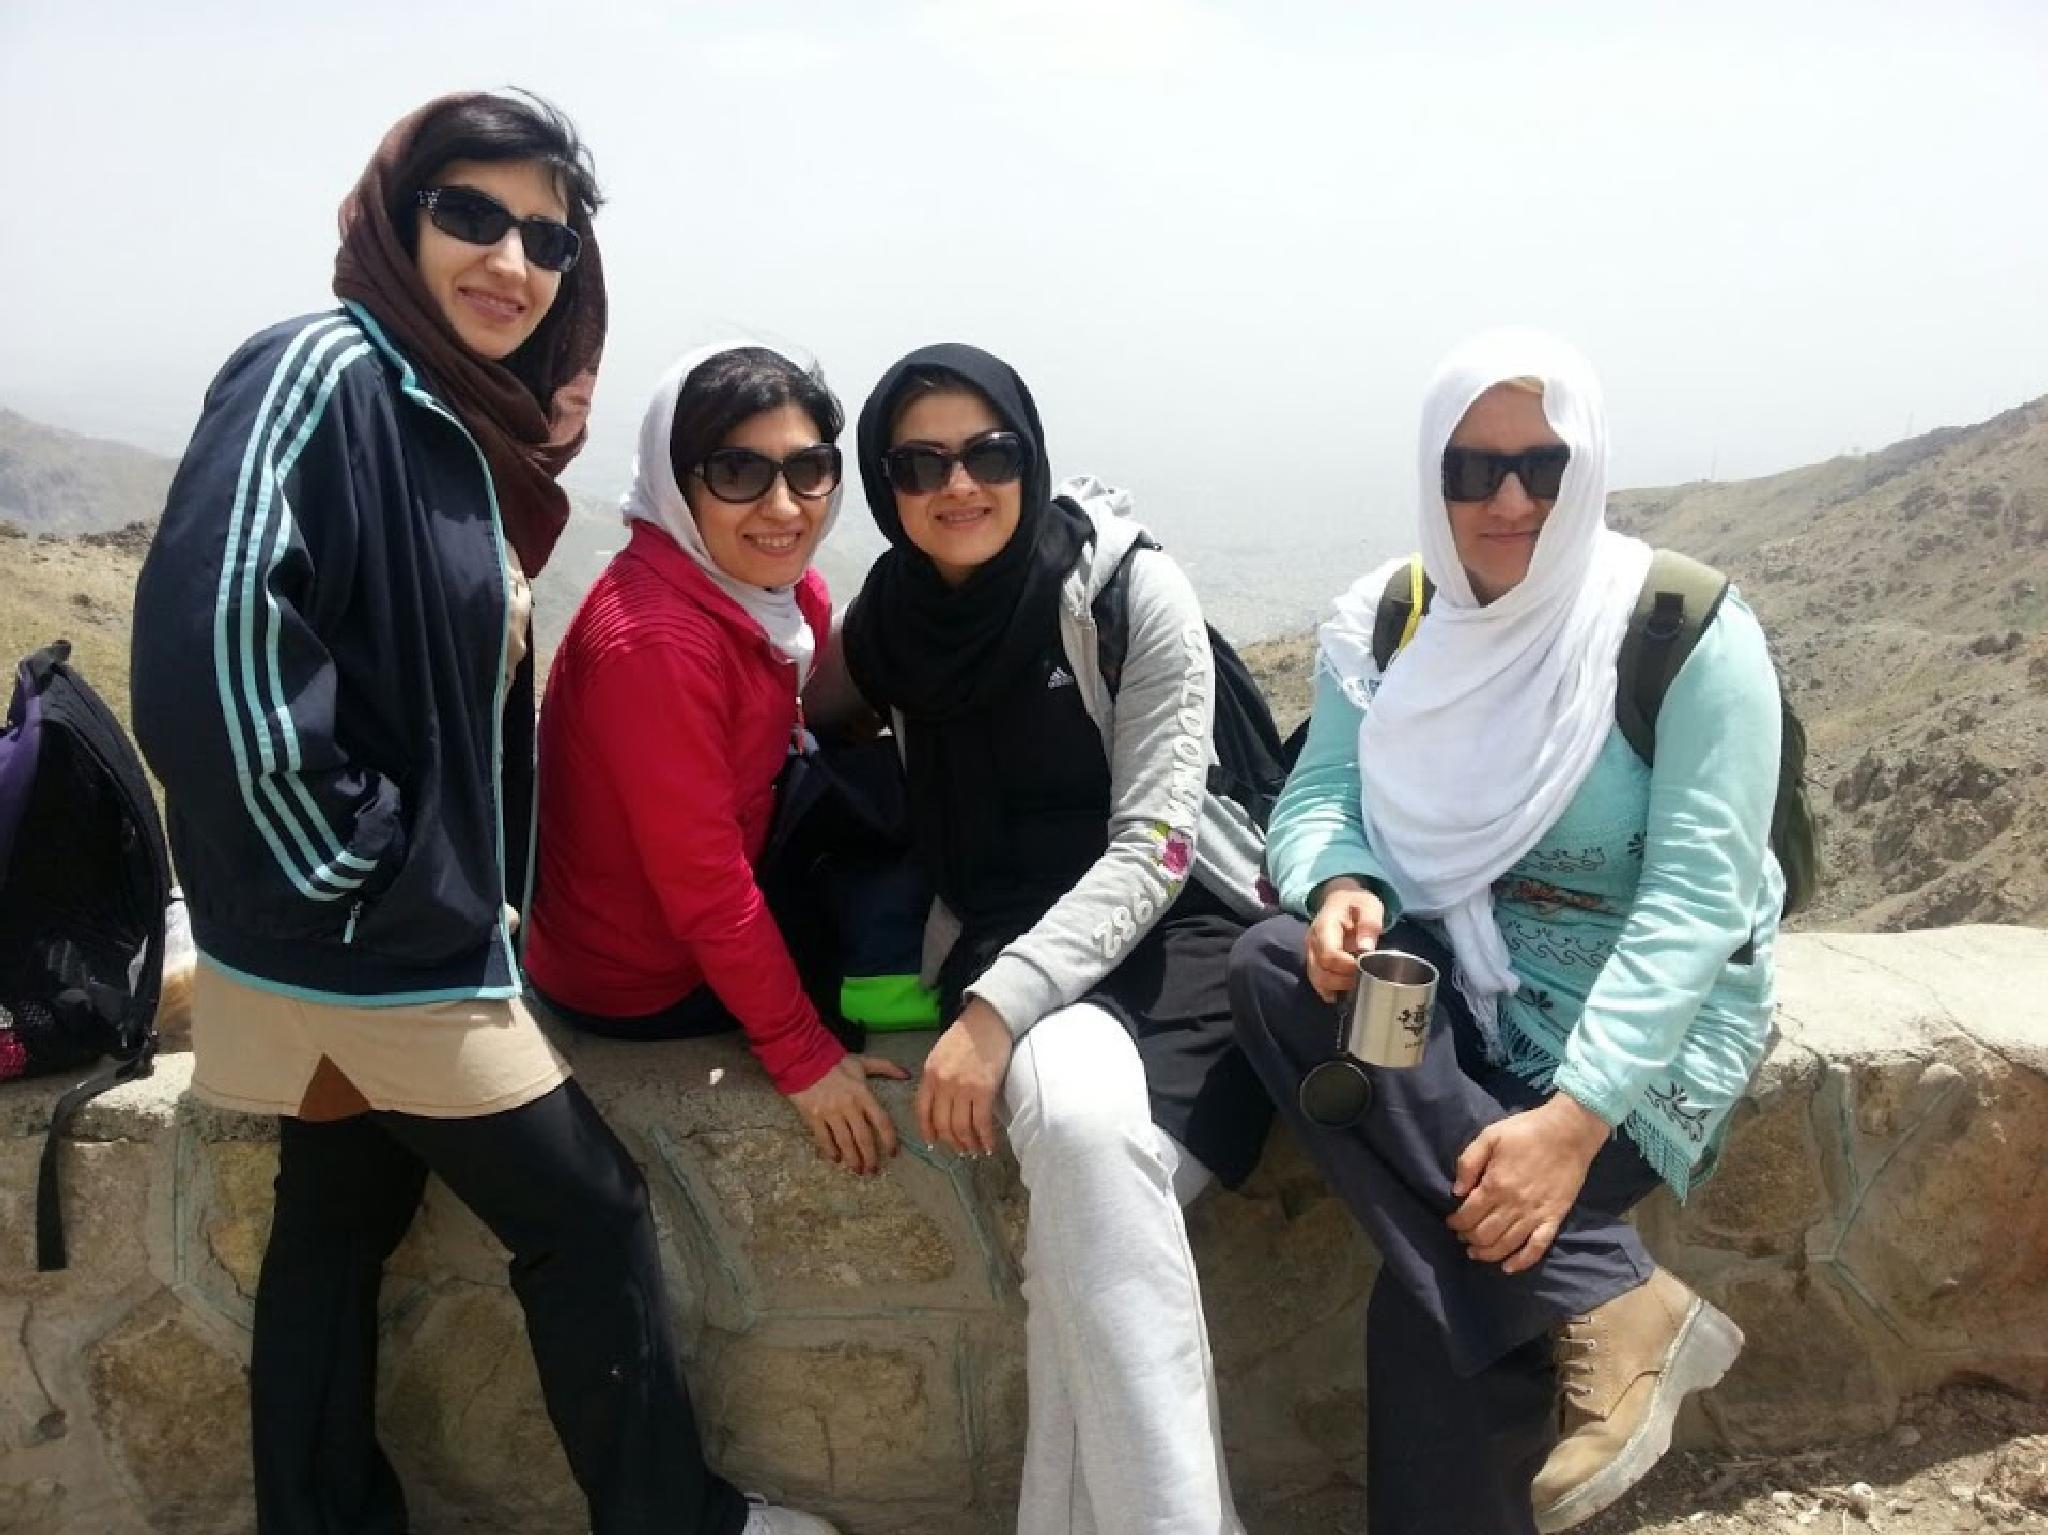 کوه نوردان by nooshafarin